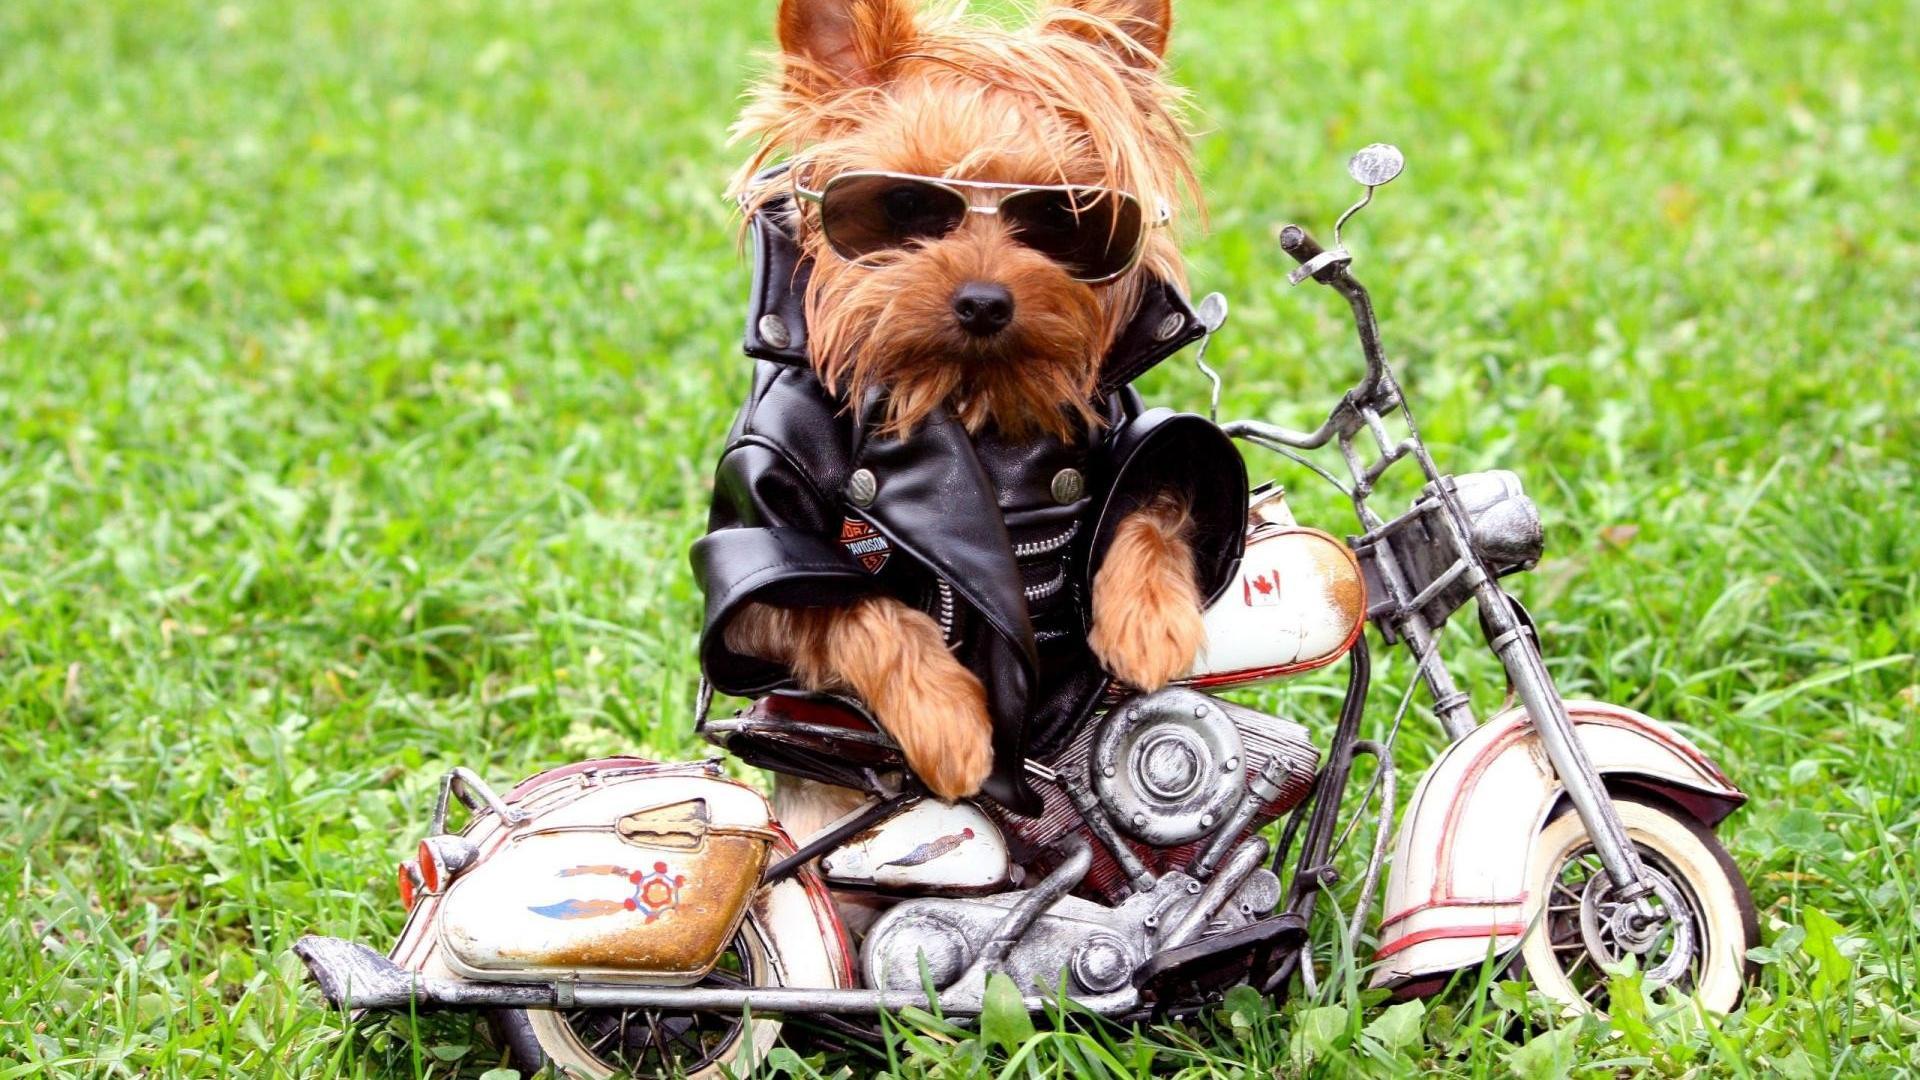 Fotos graciosa de perros - 1920x1080